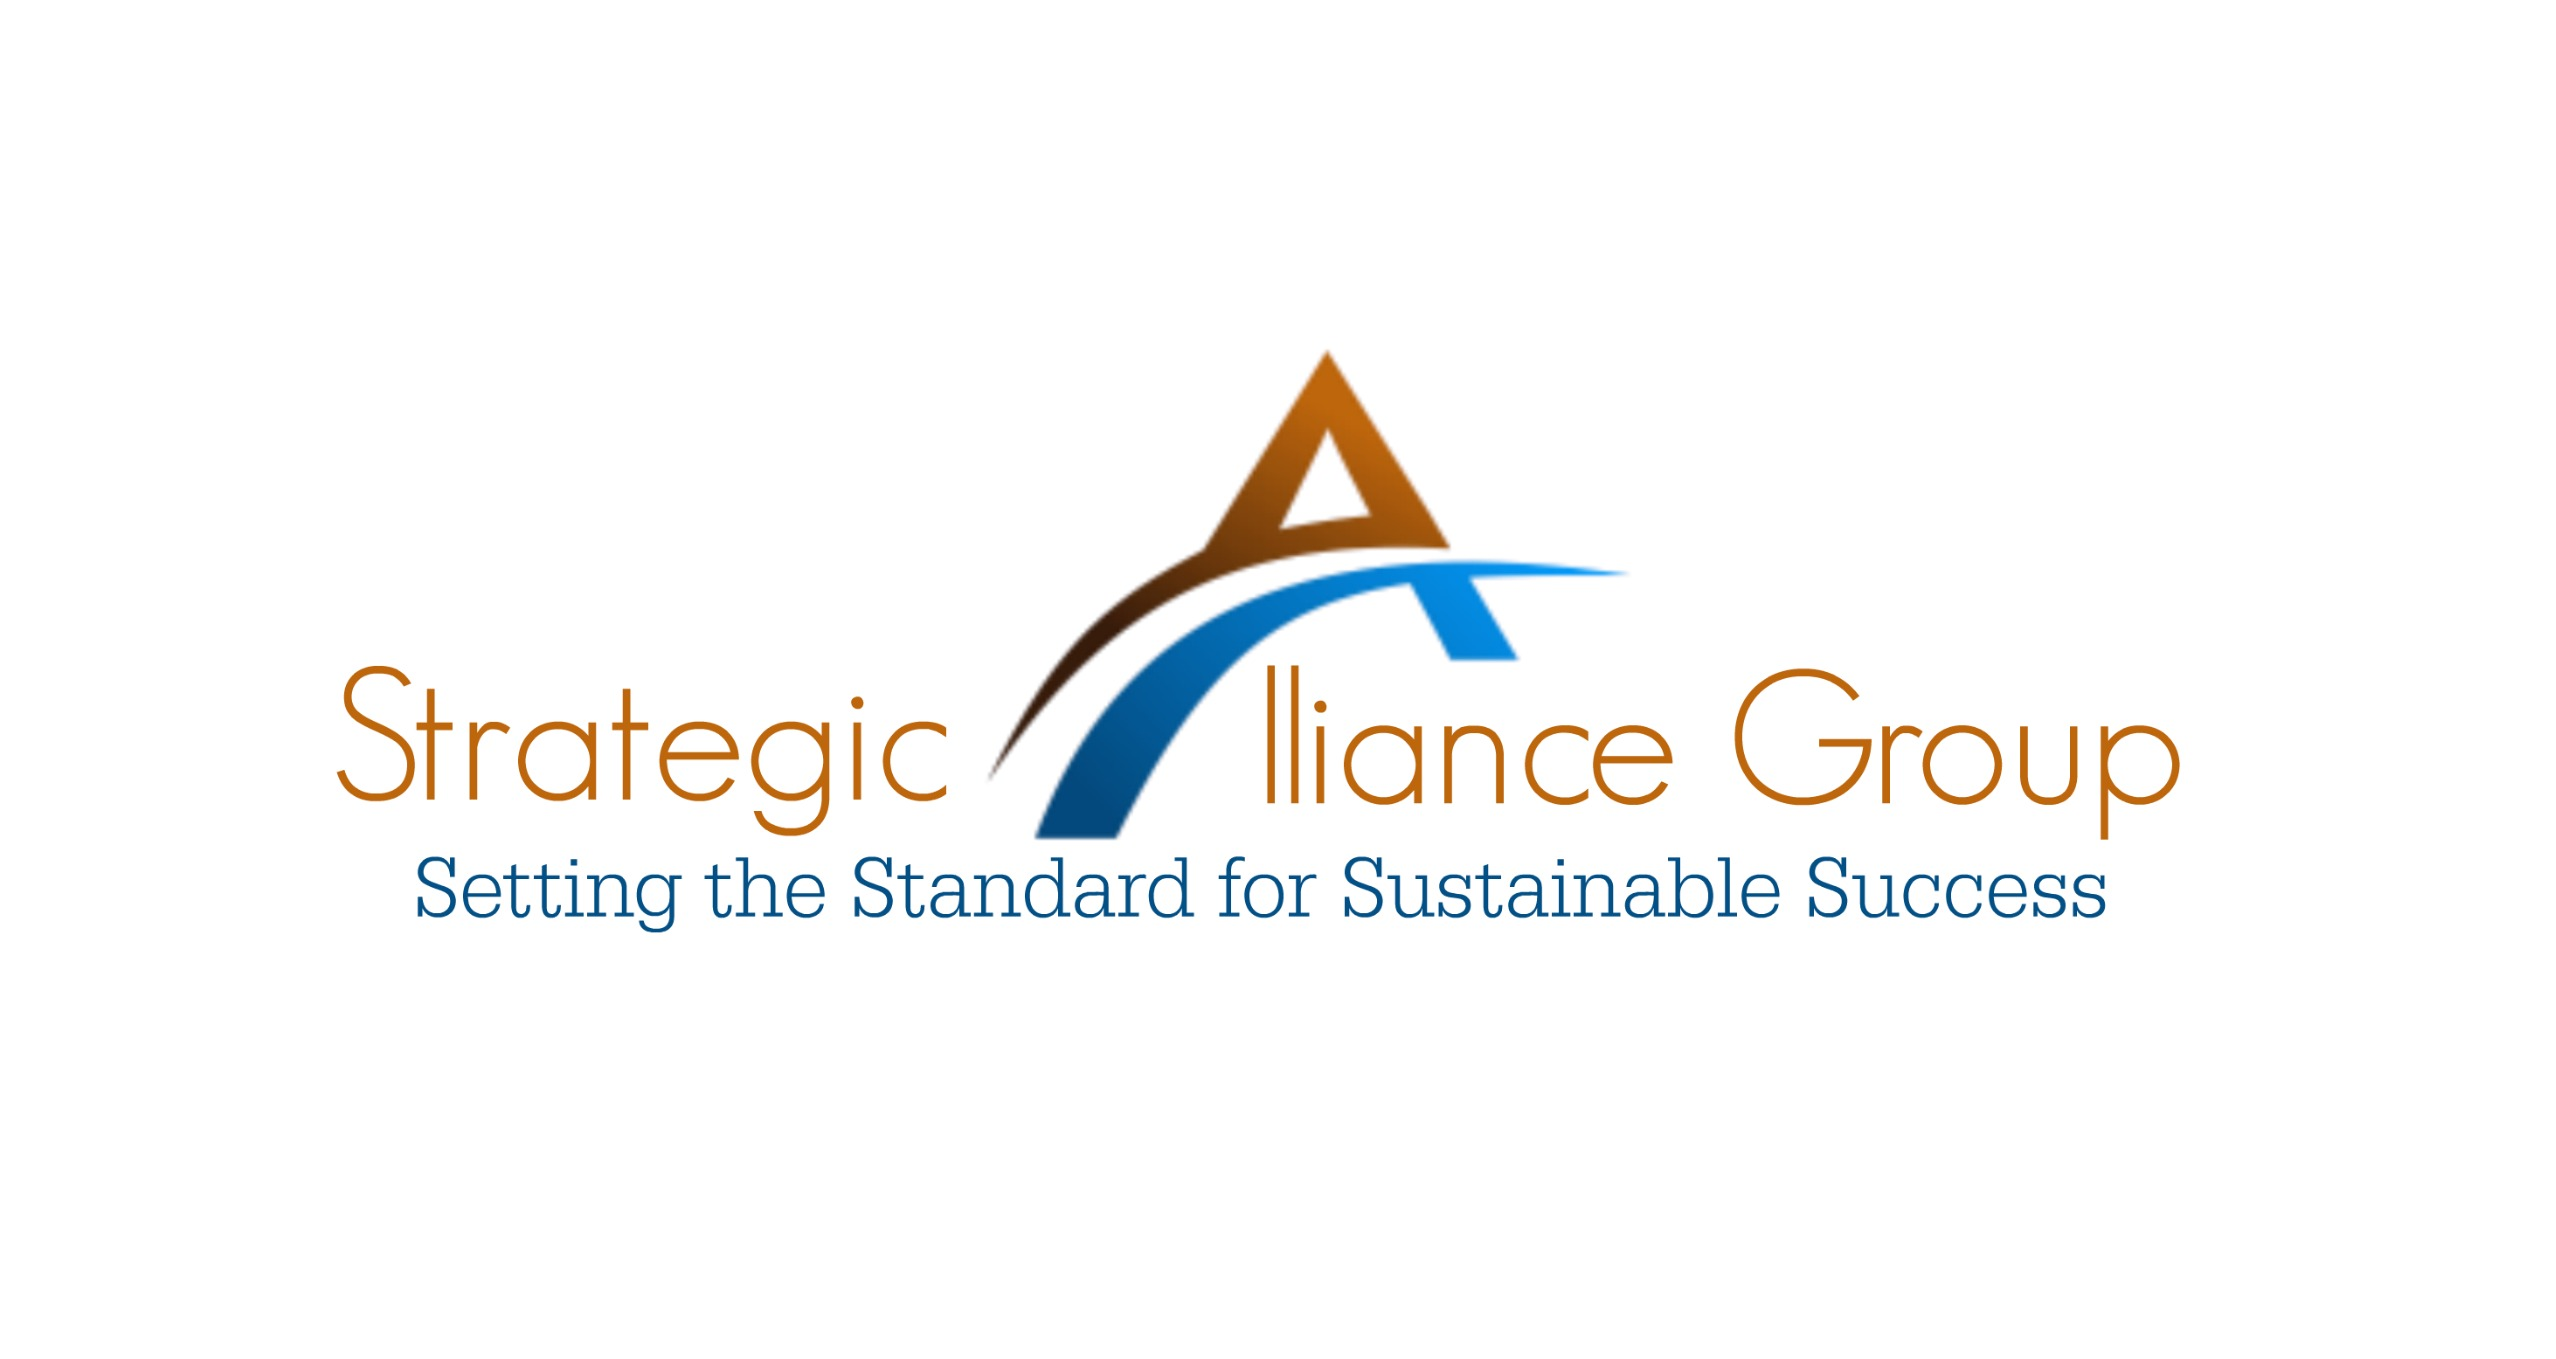 Strategic Alliance Group